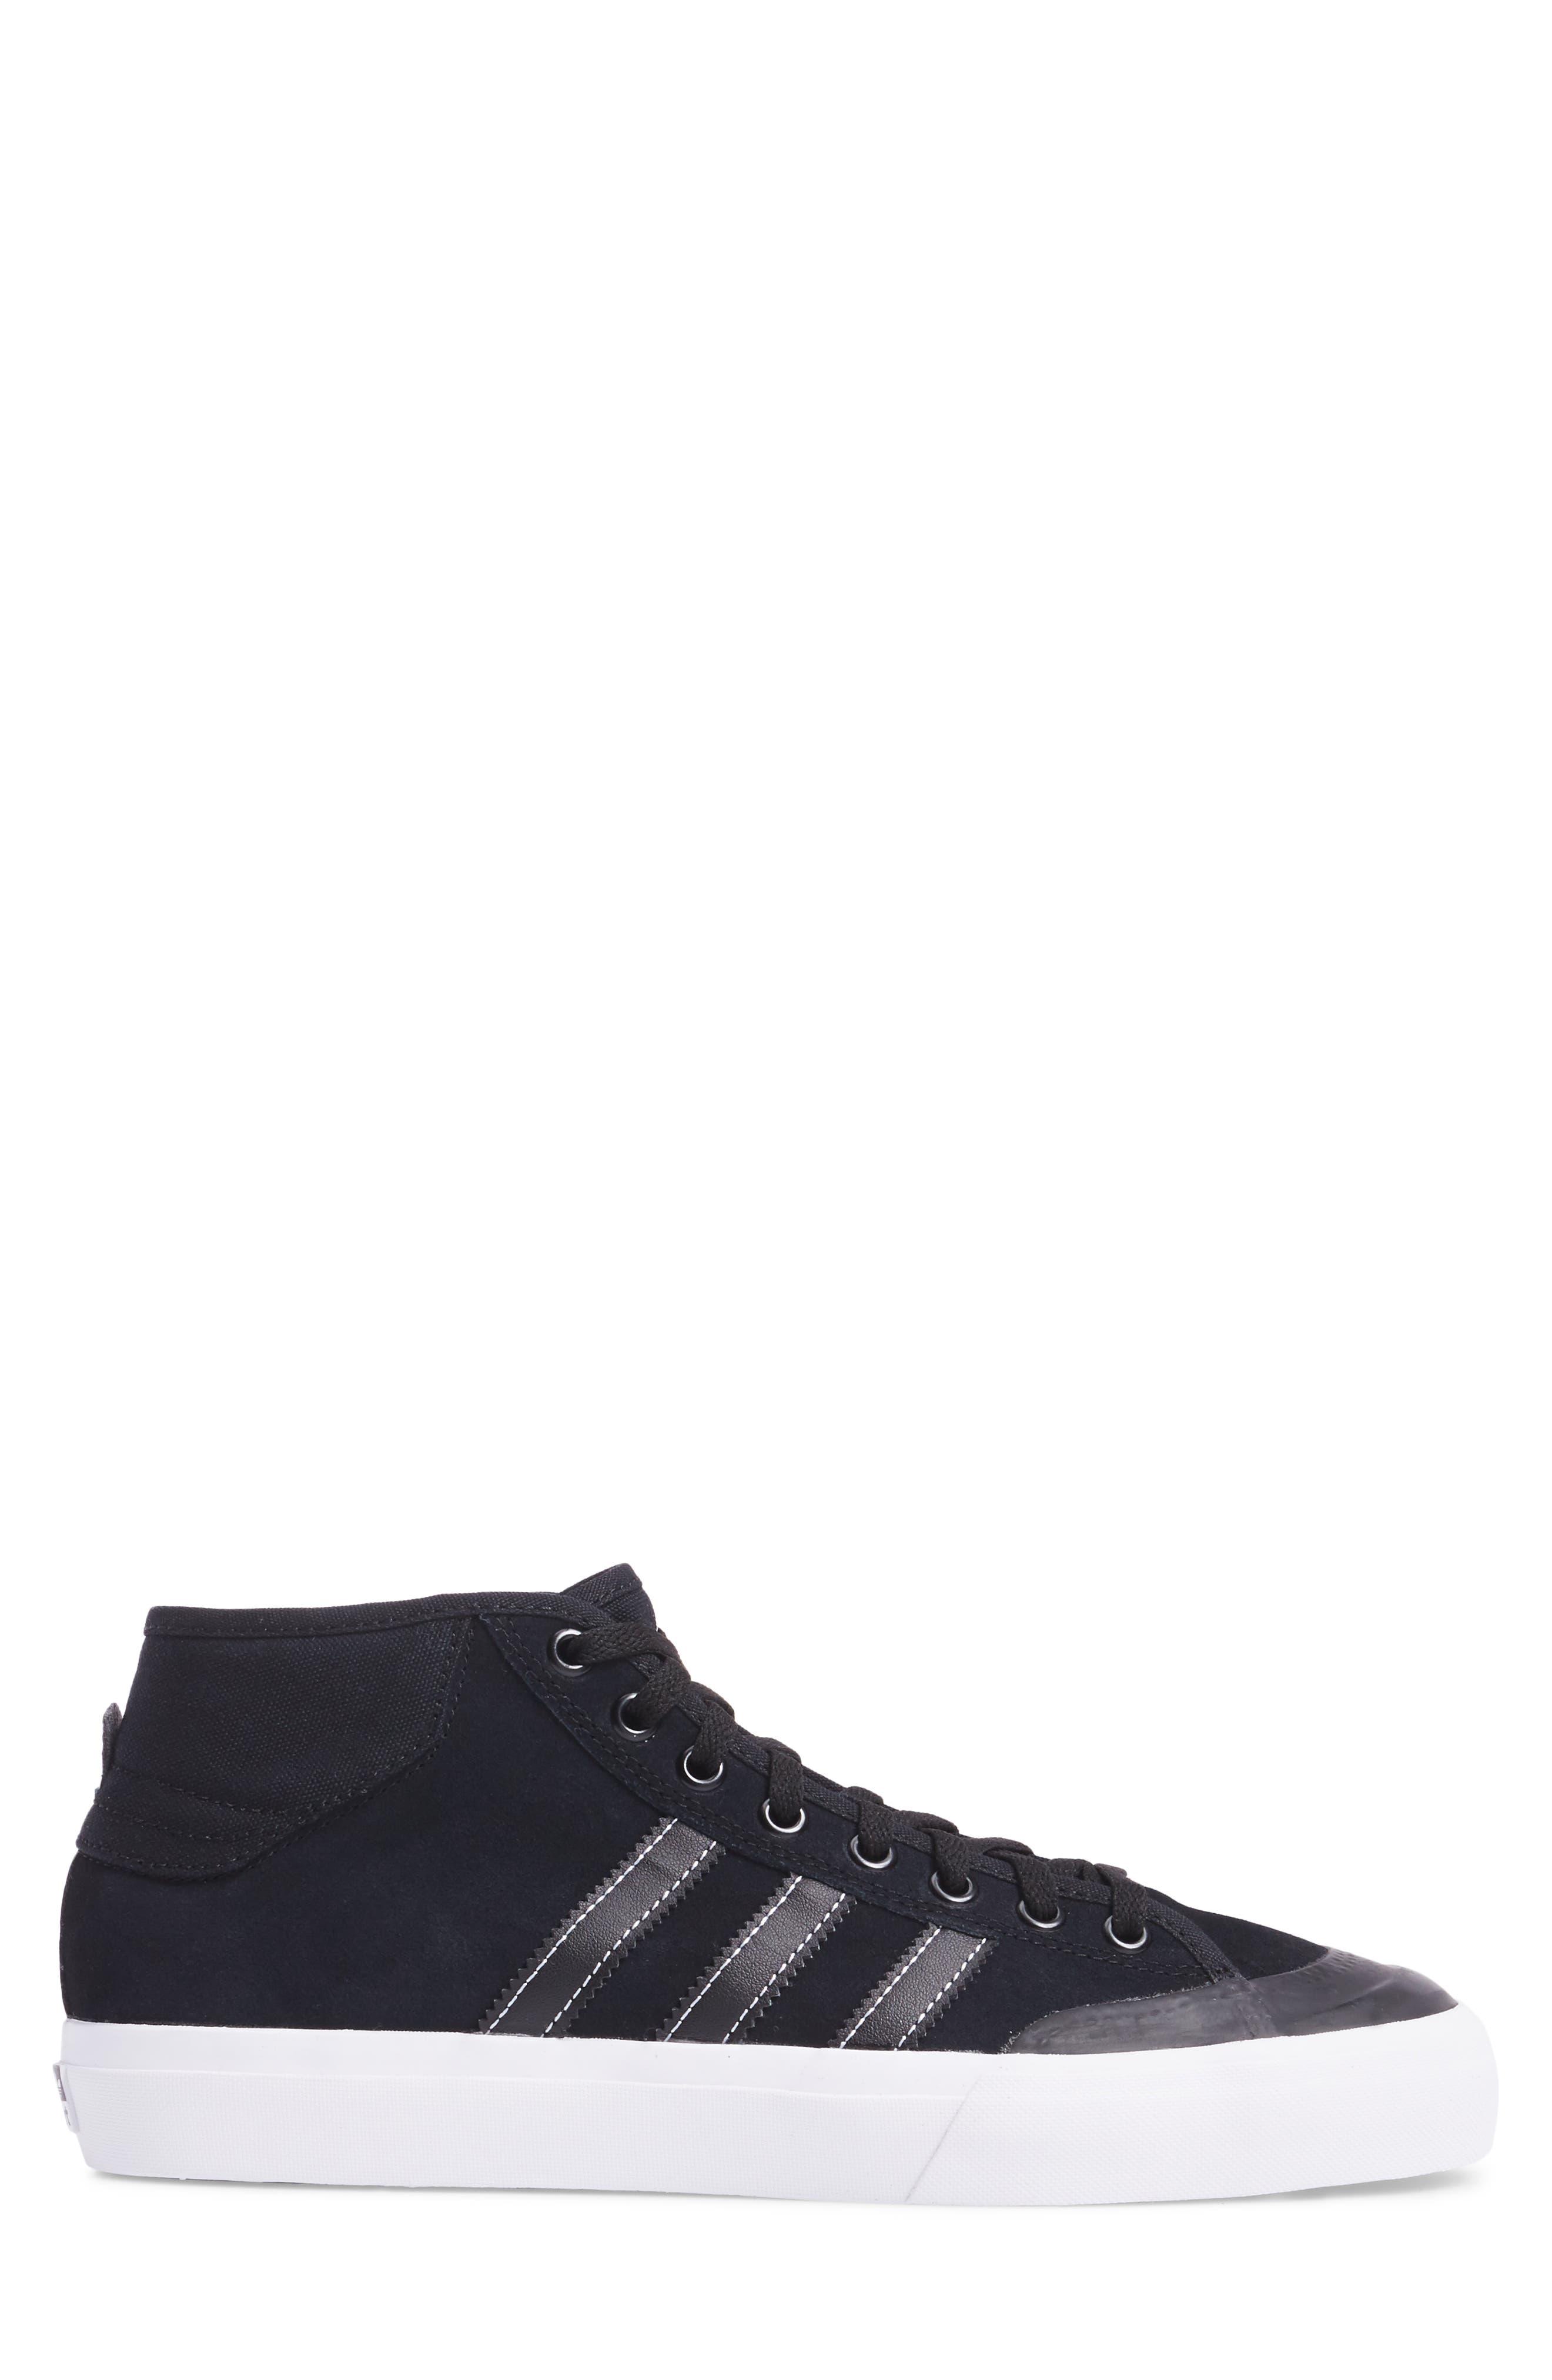 Alternate Image 3  - adidas Matchcourt Mid ADV Sneaker (Men)